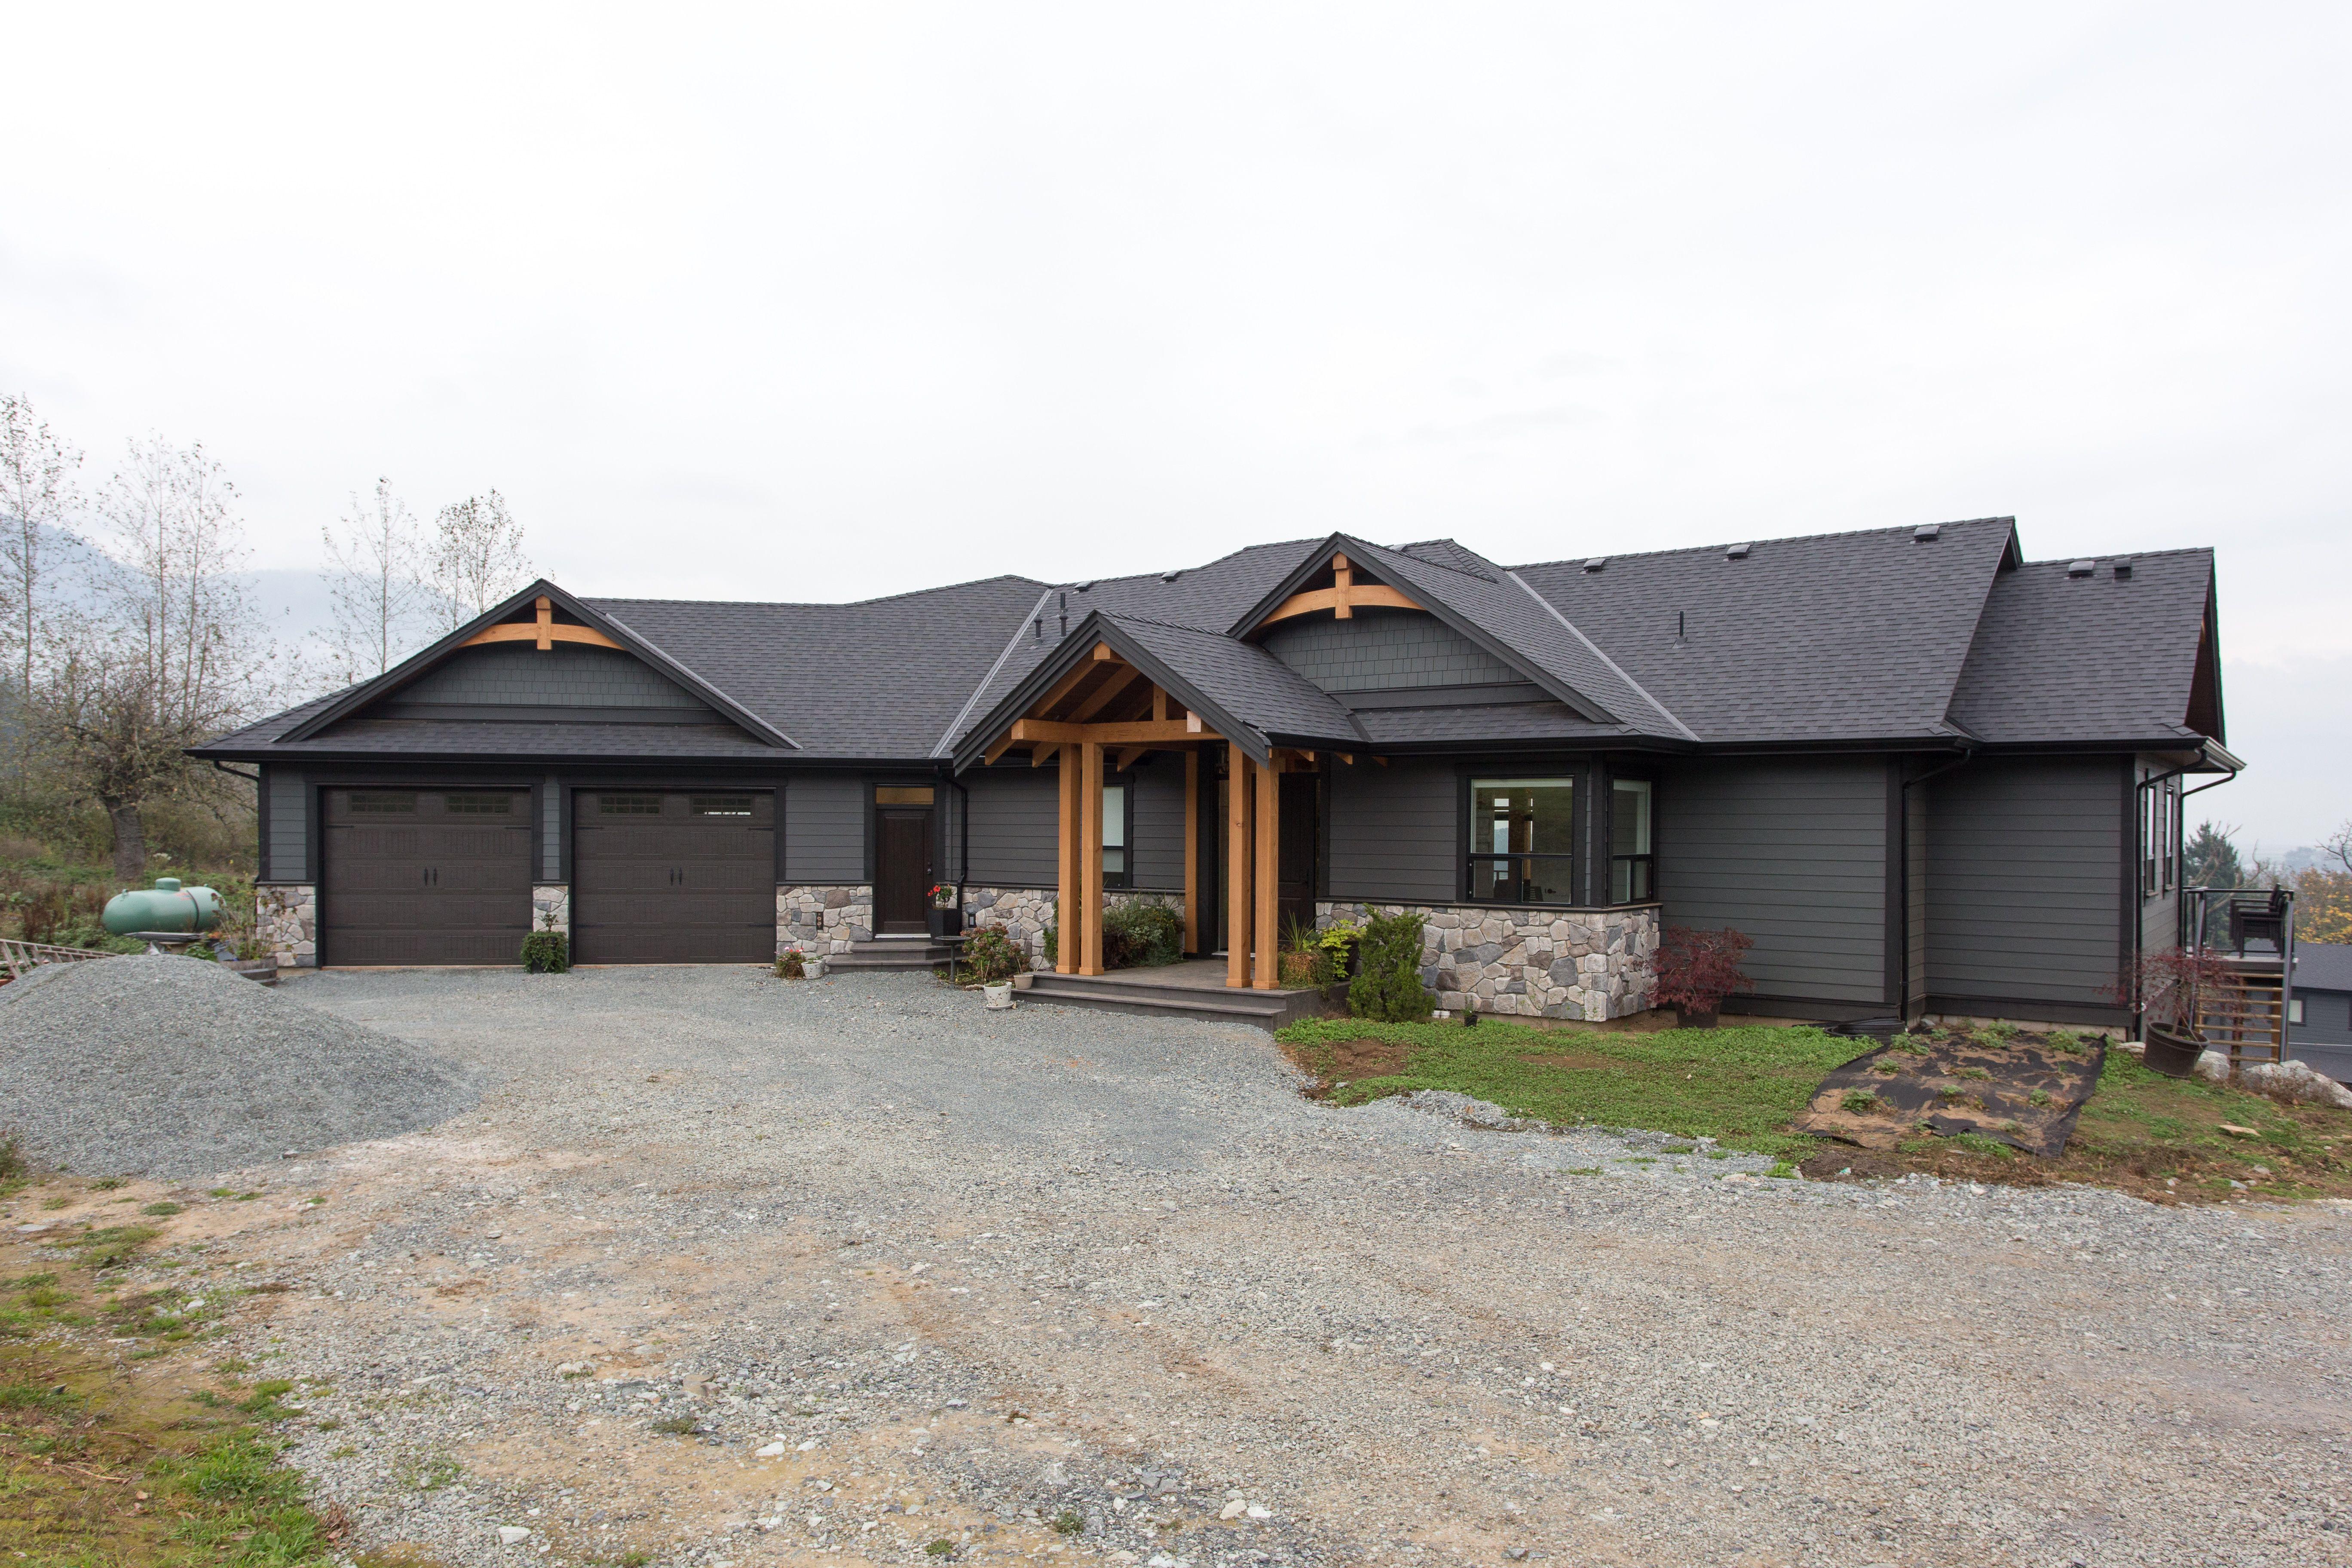 13+ Modern Farmhouse Plans With Walkout Basement Pics ...